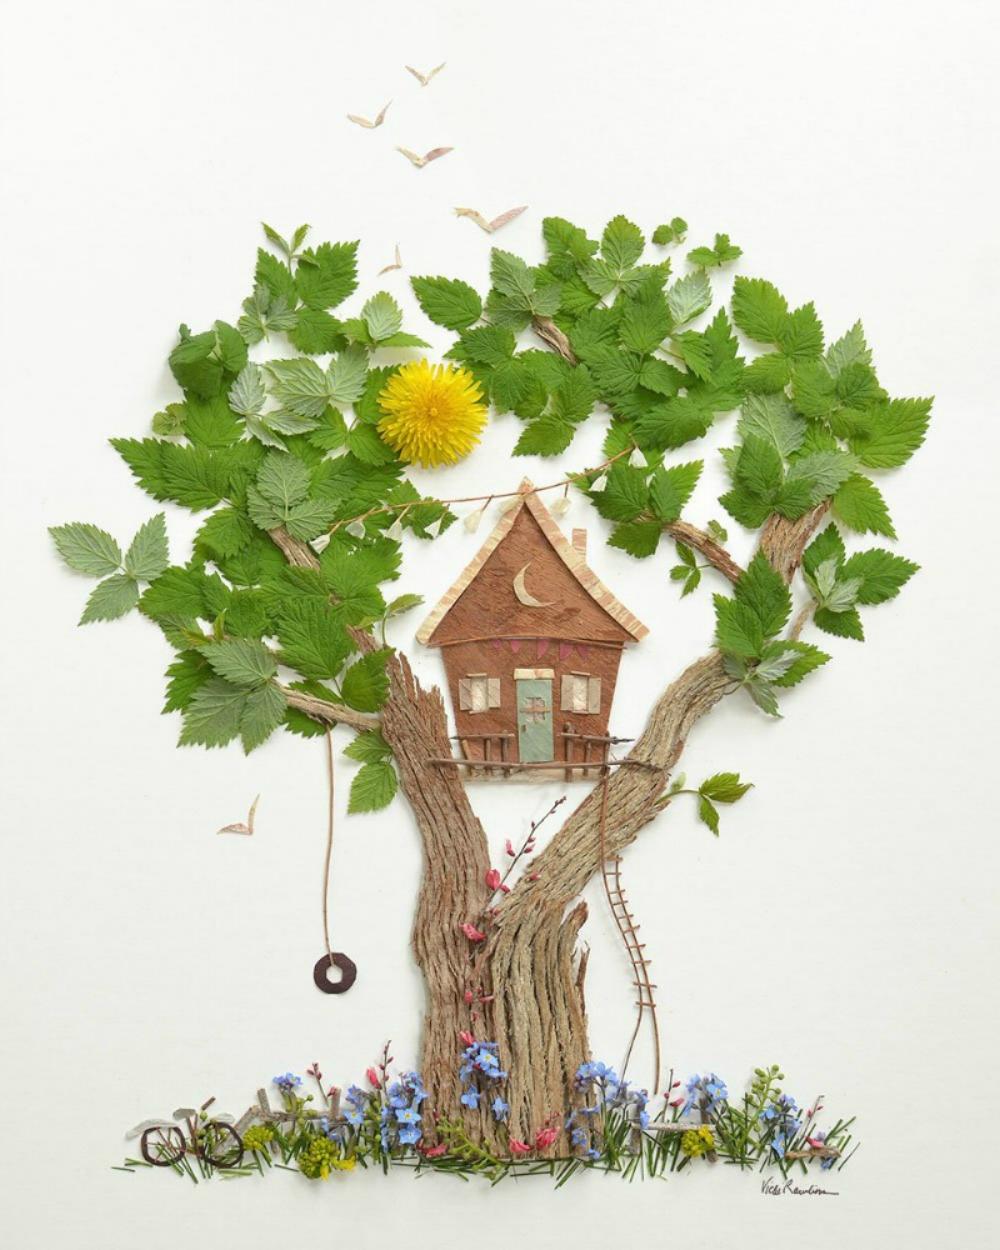 Treehouse_1000.jpg